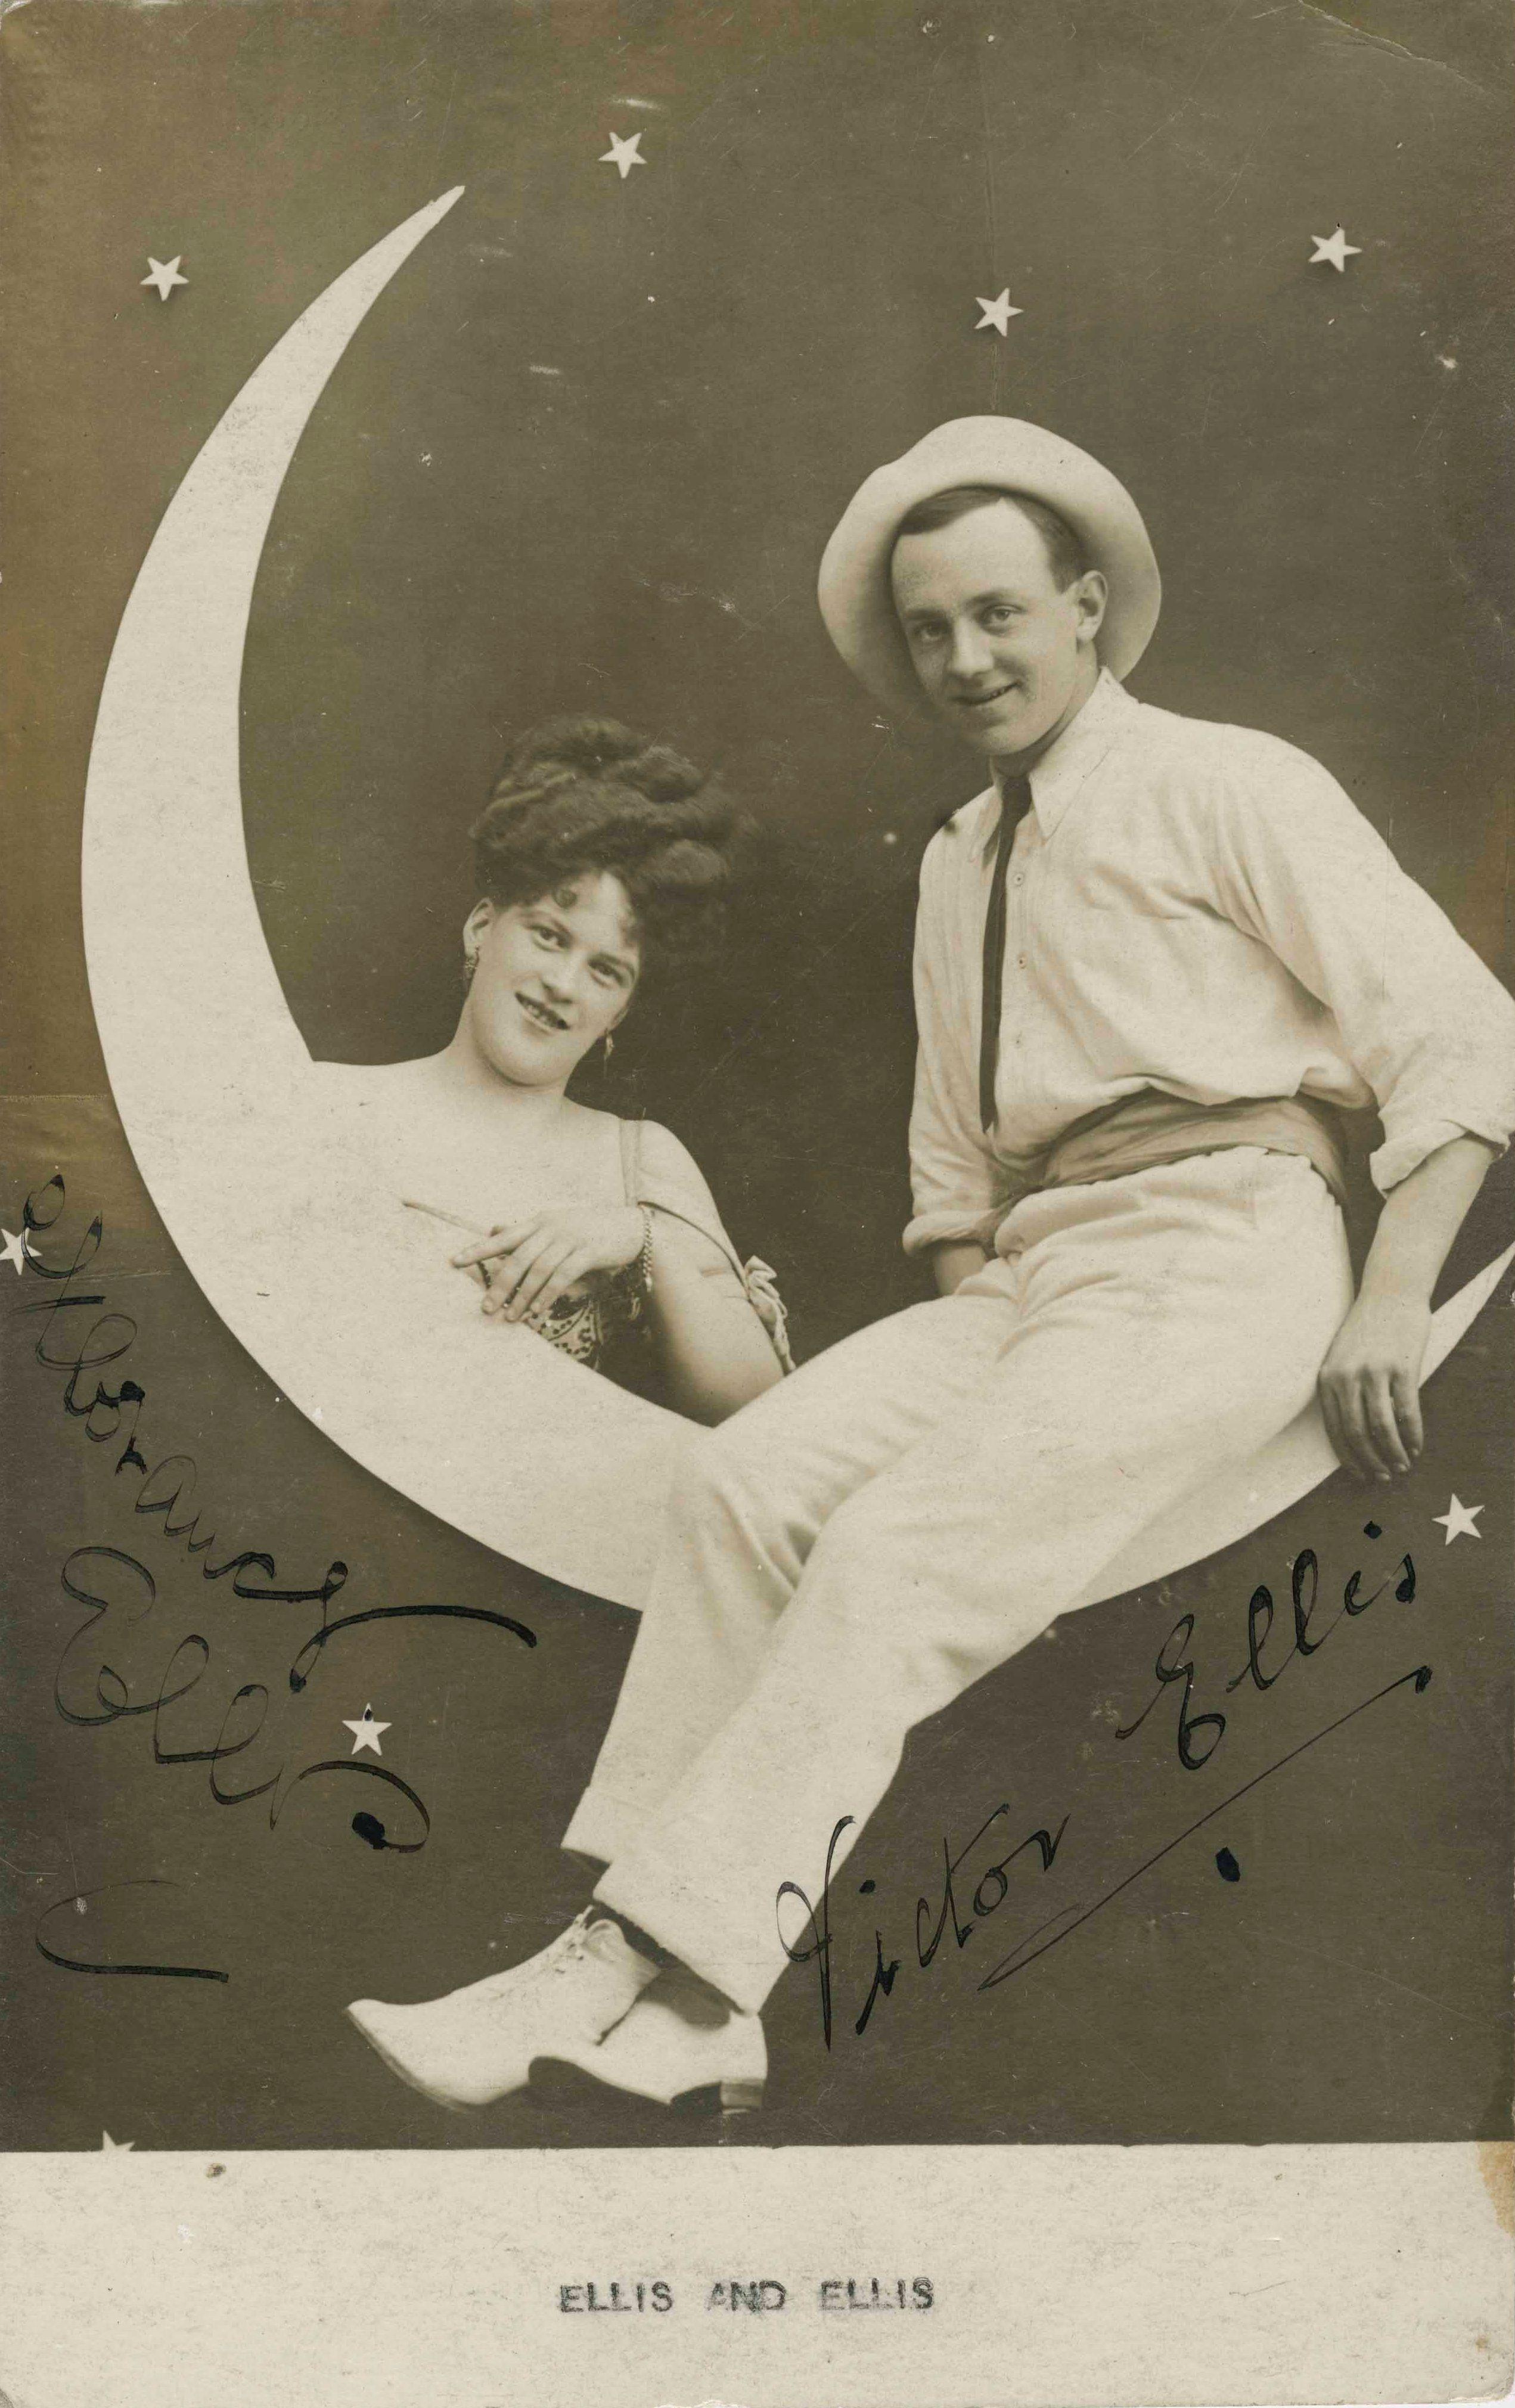 Photographic postcard of performers Ellis & Ellis